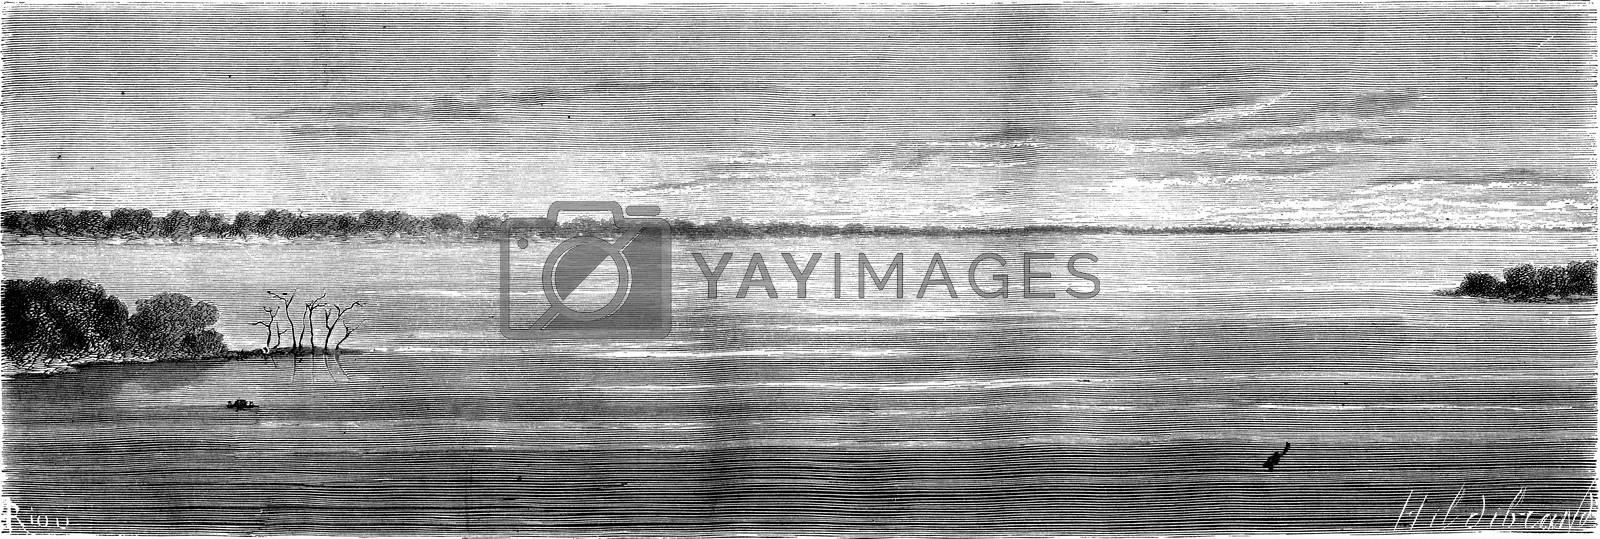 Confluence of the Ucayali and Maranon, vintage engraved illustration. Le Tour du Monde, Travel Journal, (1865).